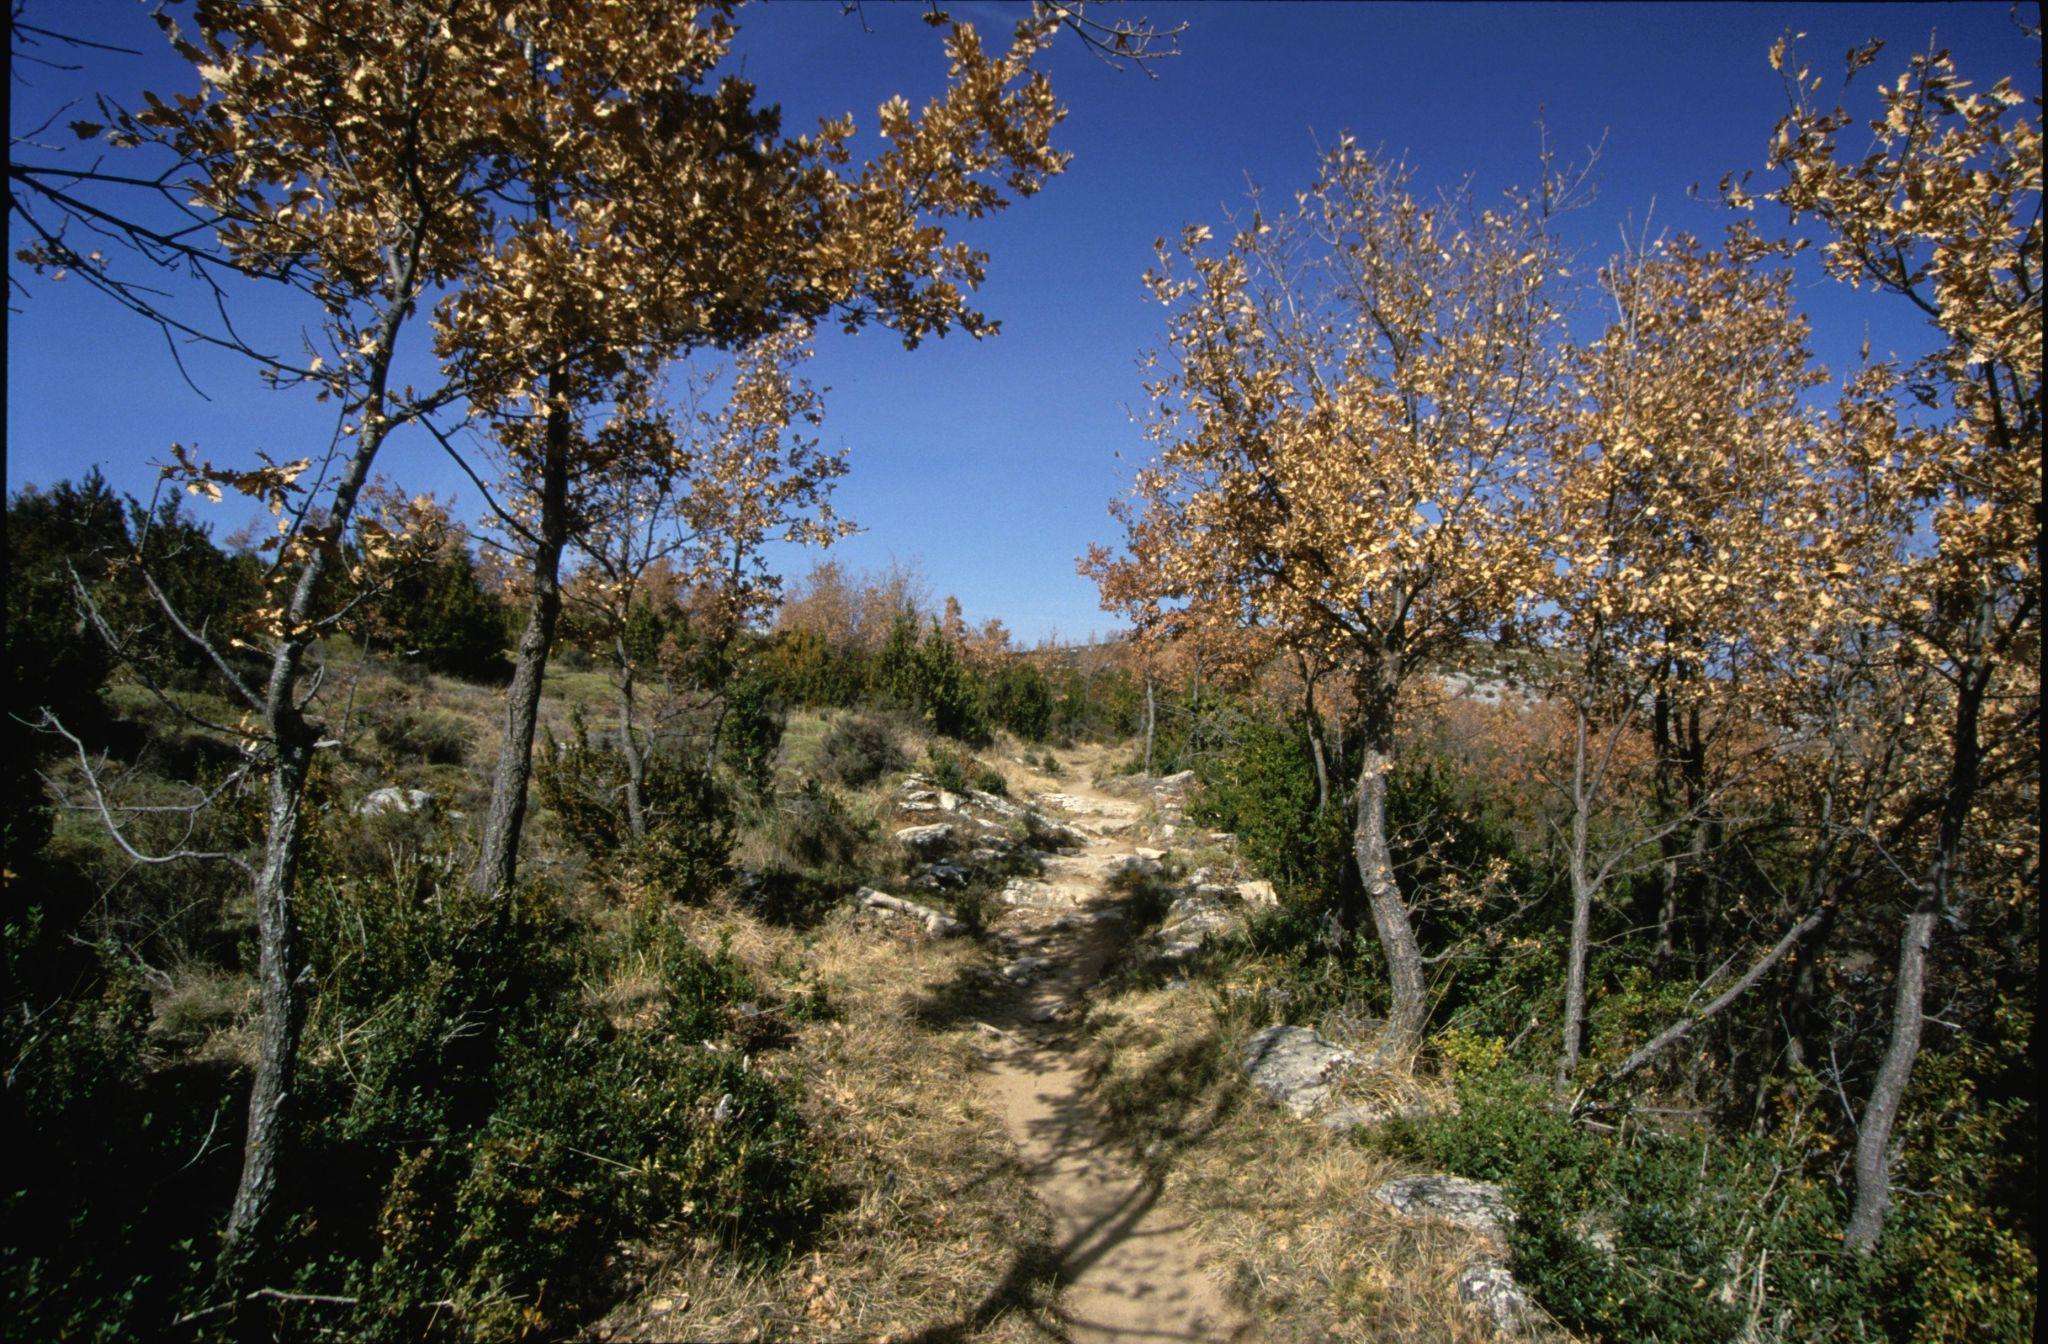 Otin, Spain